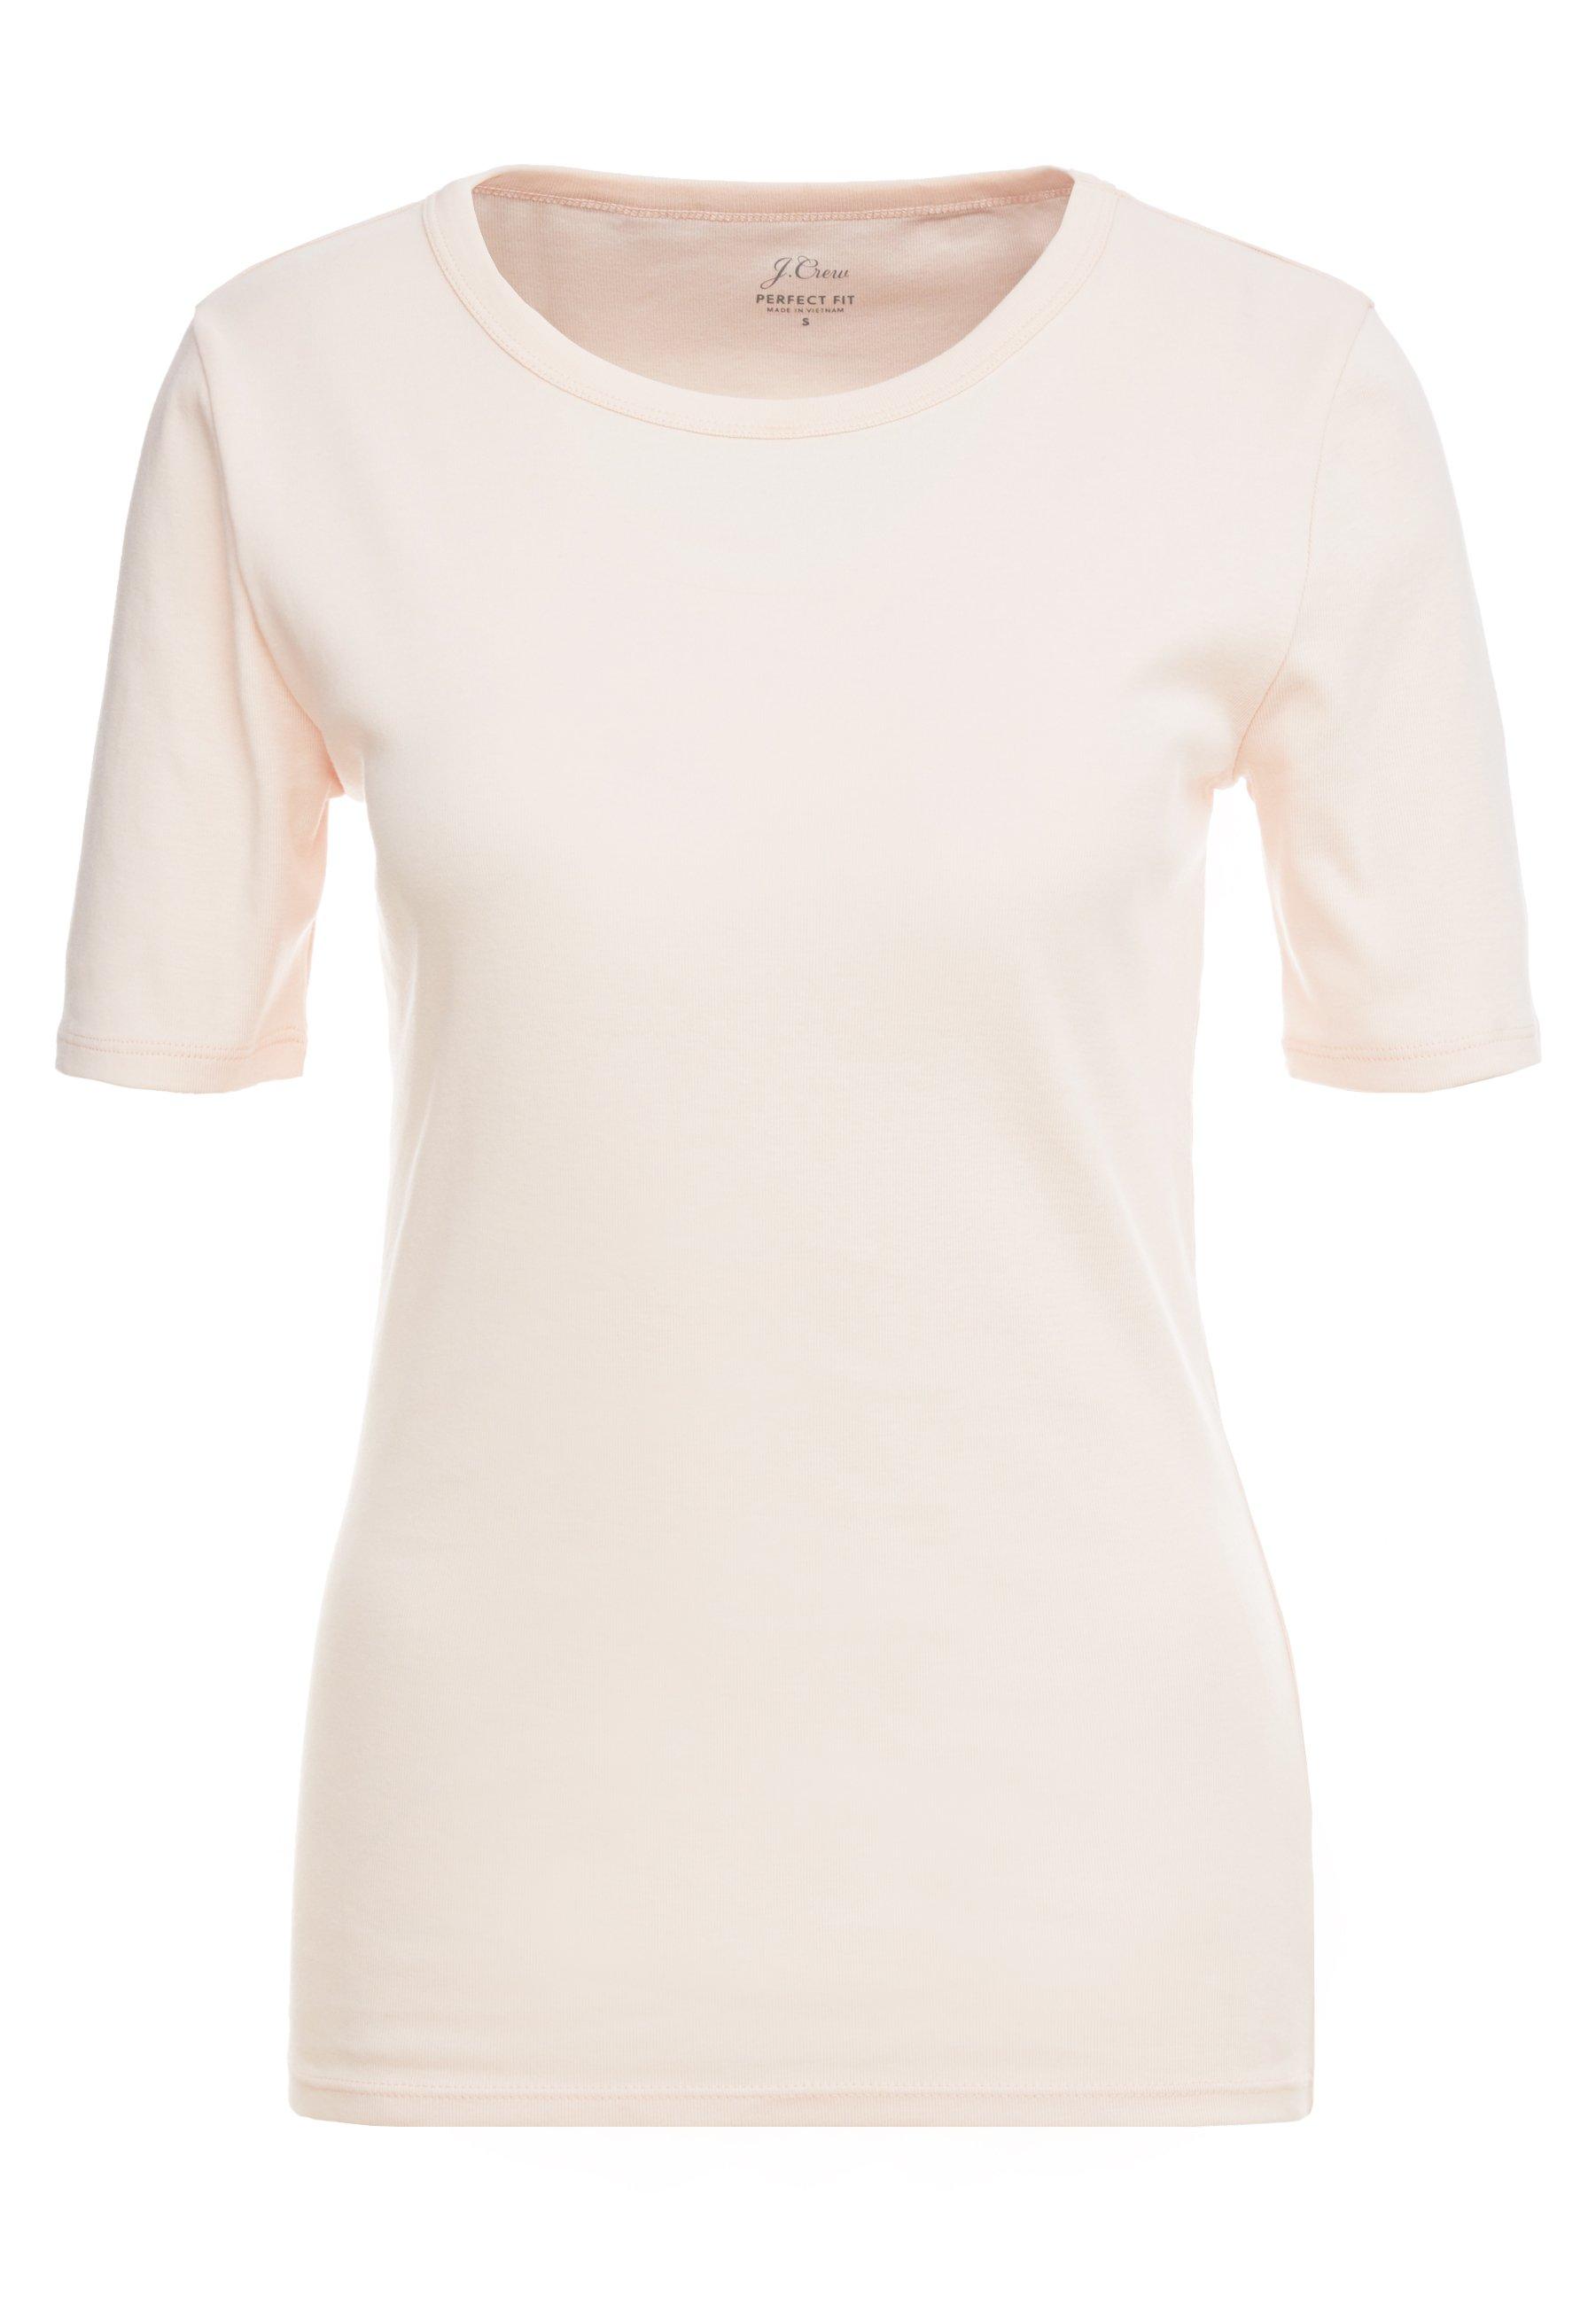 J.CREW SLIM PEFECT ELBOW SLEEVE TEE - Basic T-shirt - subtle pink